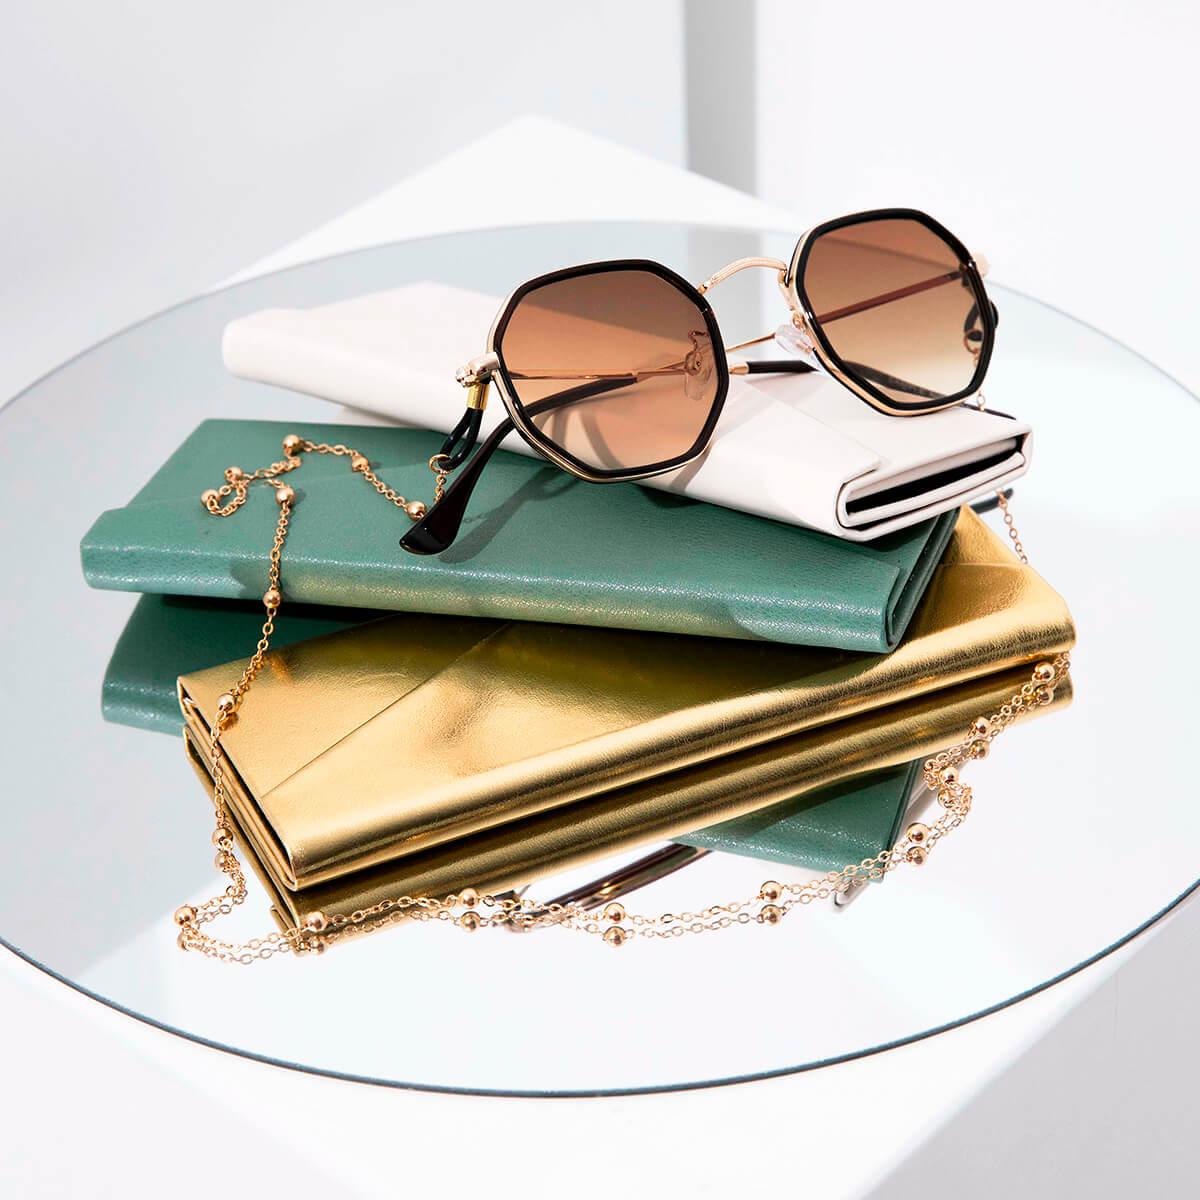 Zonnebril | Wink Optics | Groothandel kleding